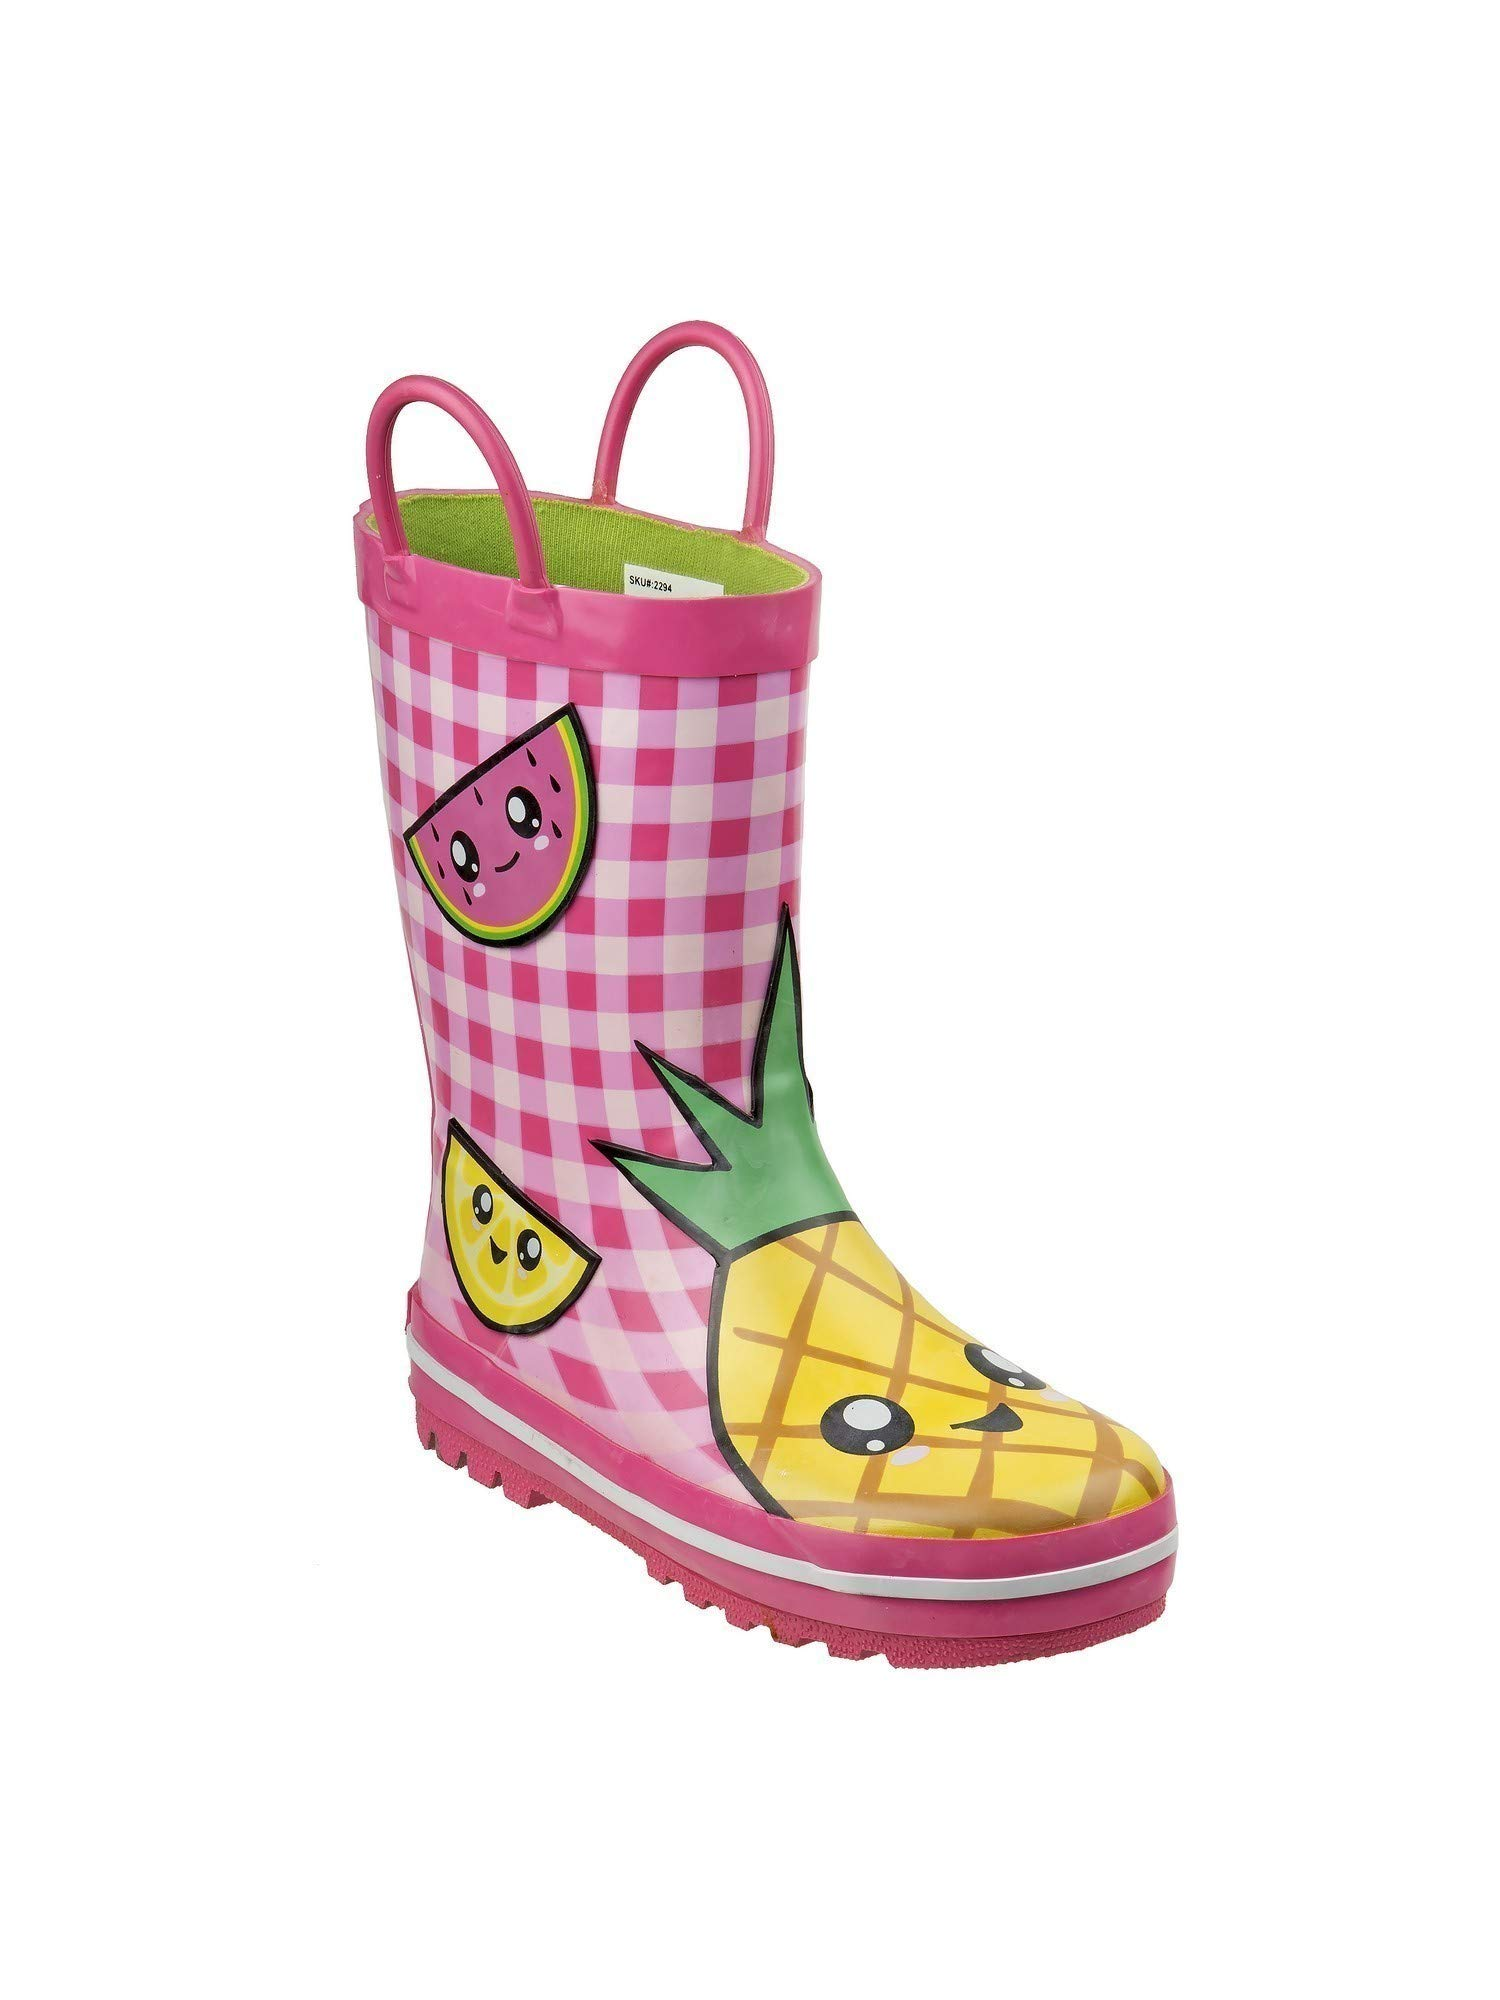 Laura Ashley Girls Pink Checker Fruit Print Casual Rain Boots 12 Kids